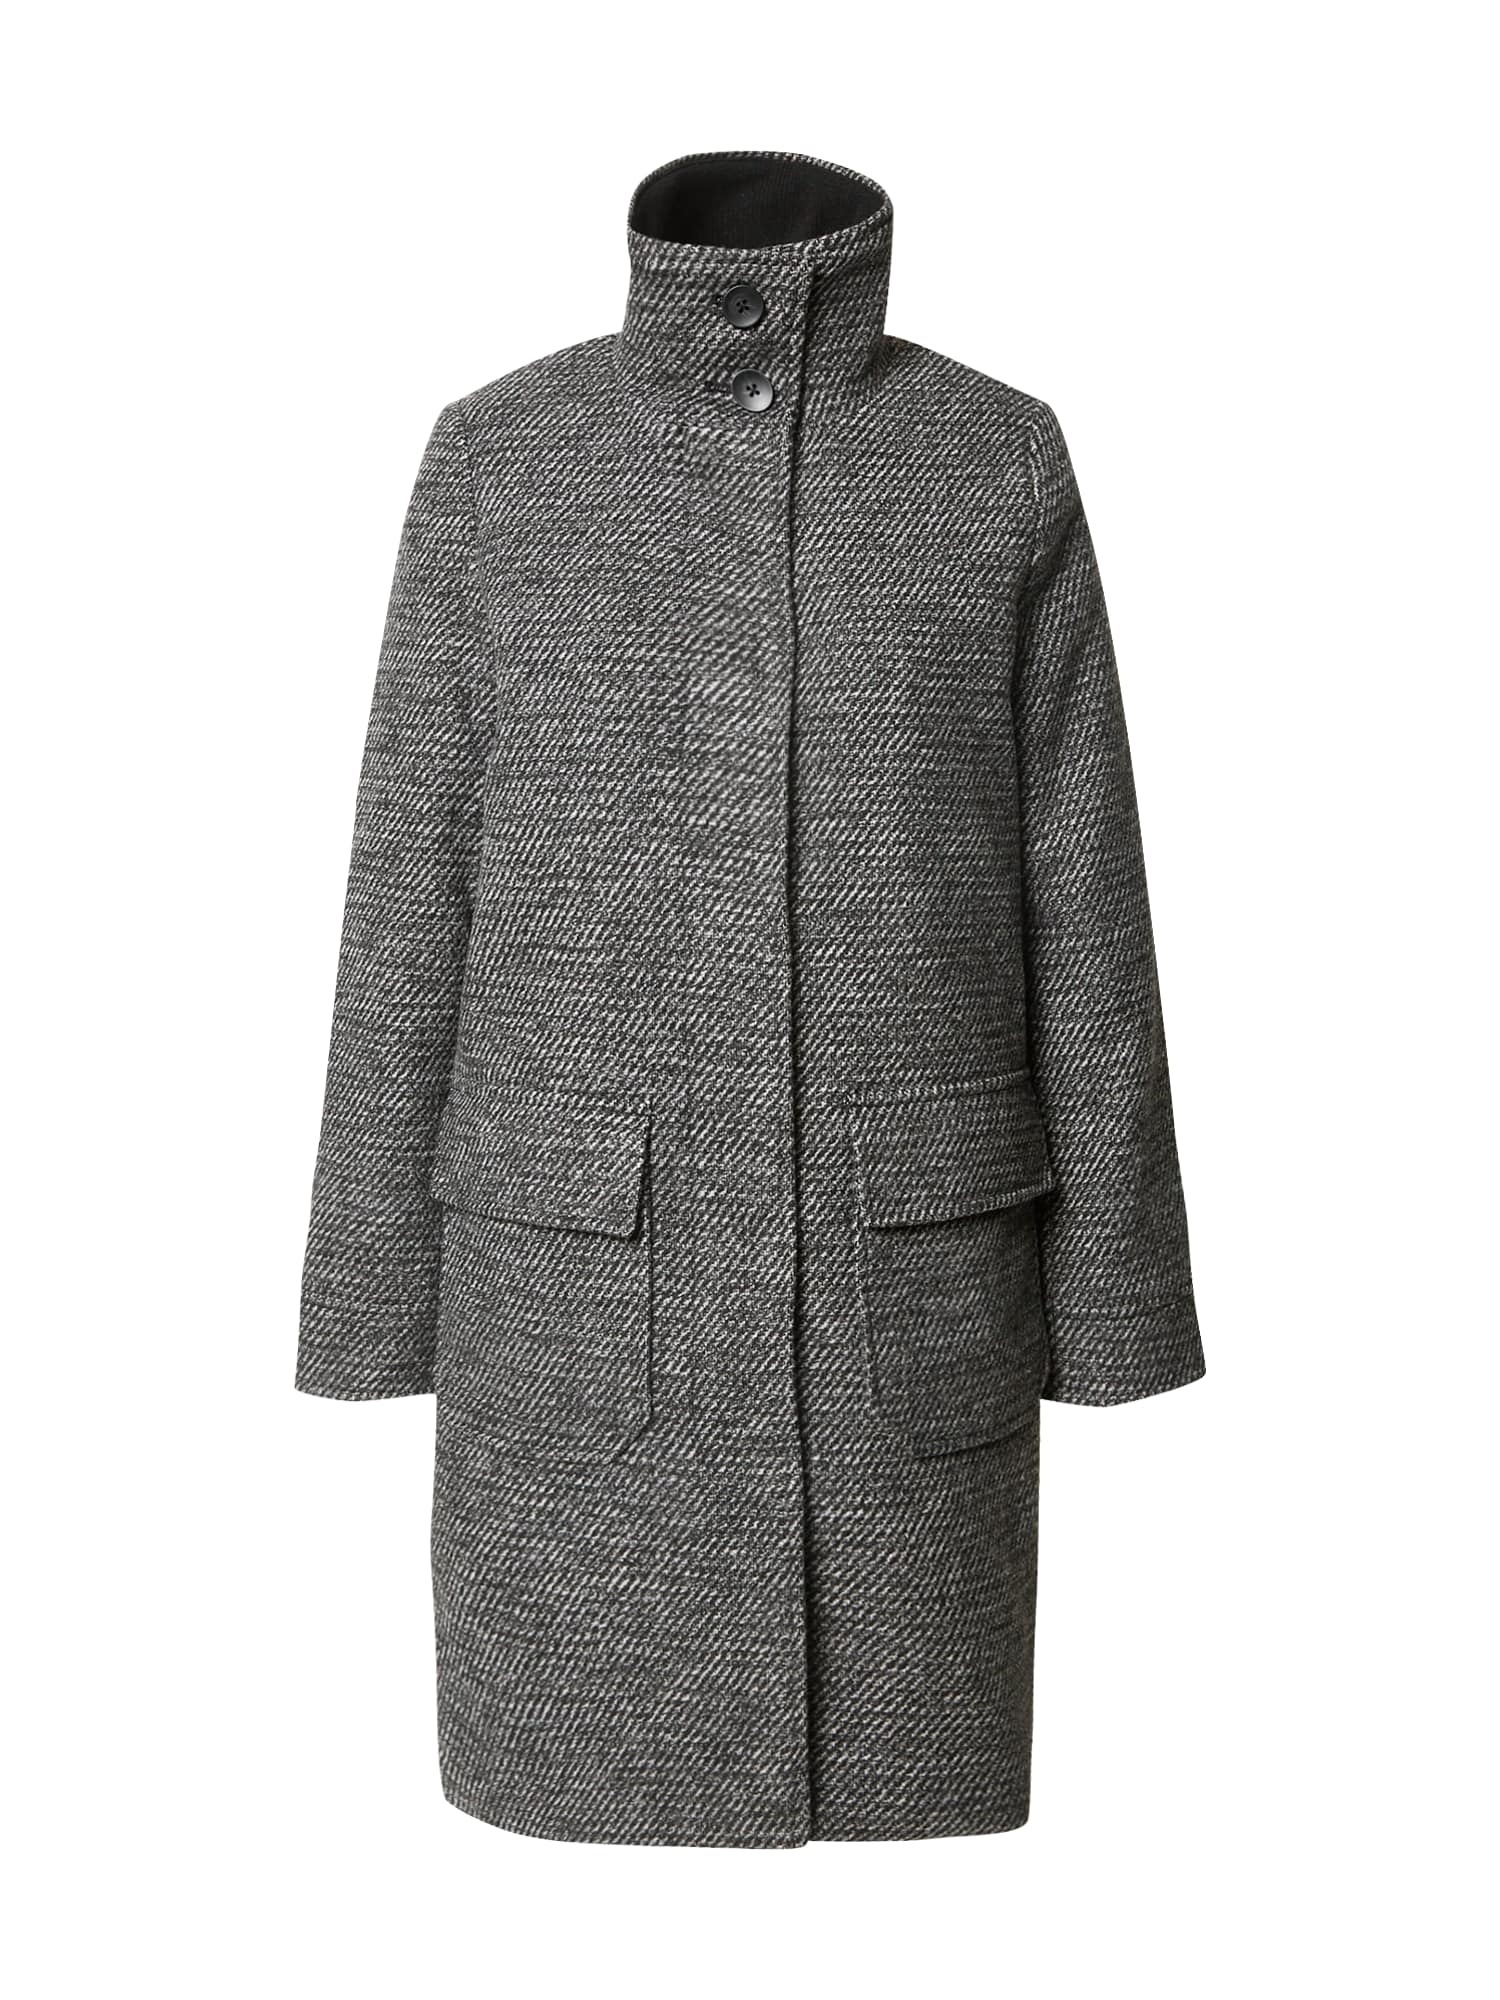 TOM TAILOR Demisezoninis paltas margai pilka